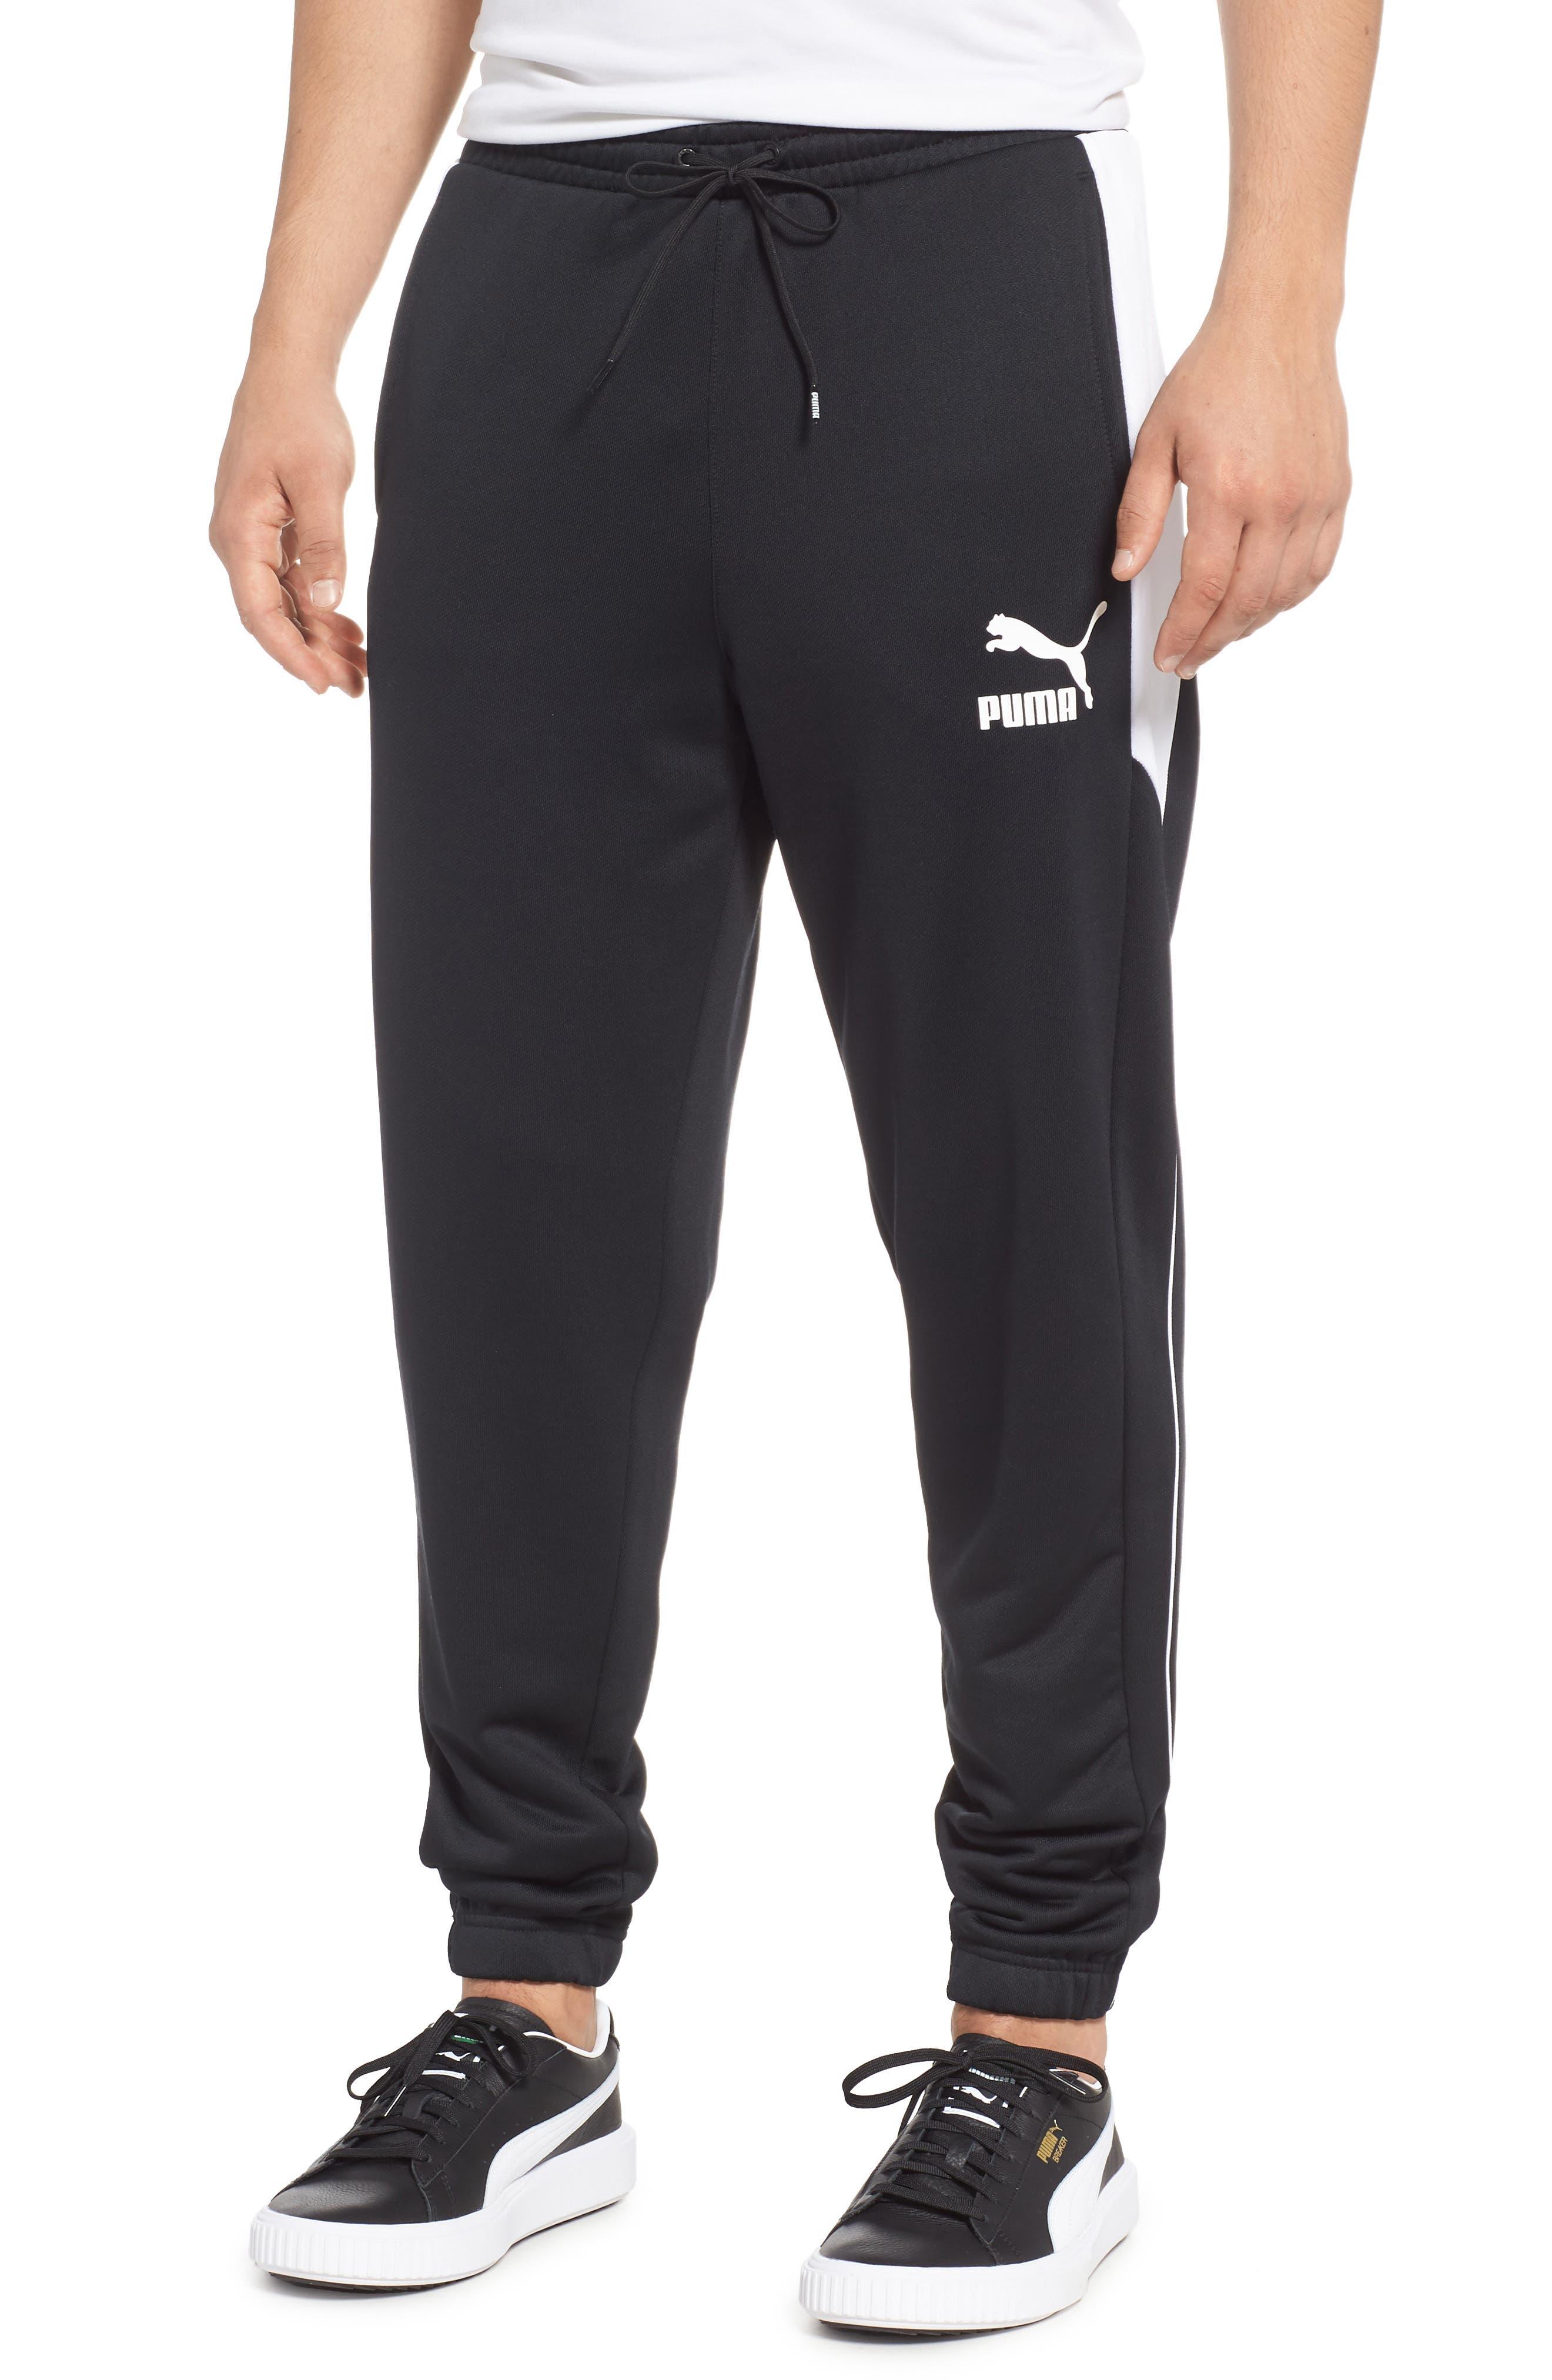 Retro Sweatpants,                             Main thumbnail 1, color,                             PUMA BLACK